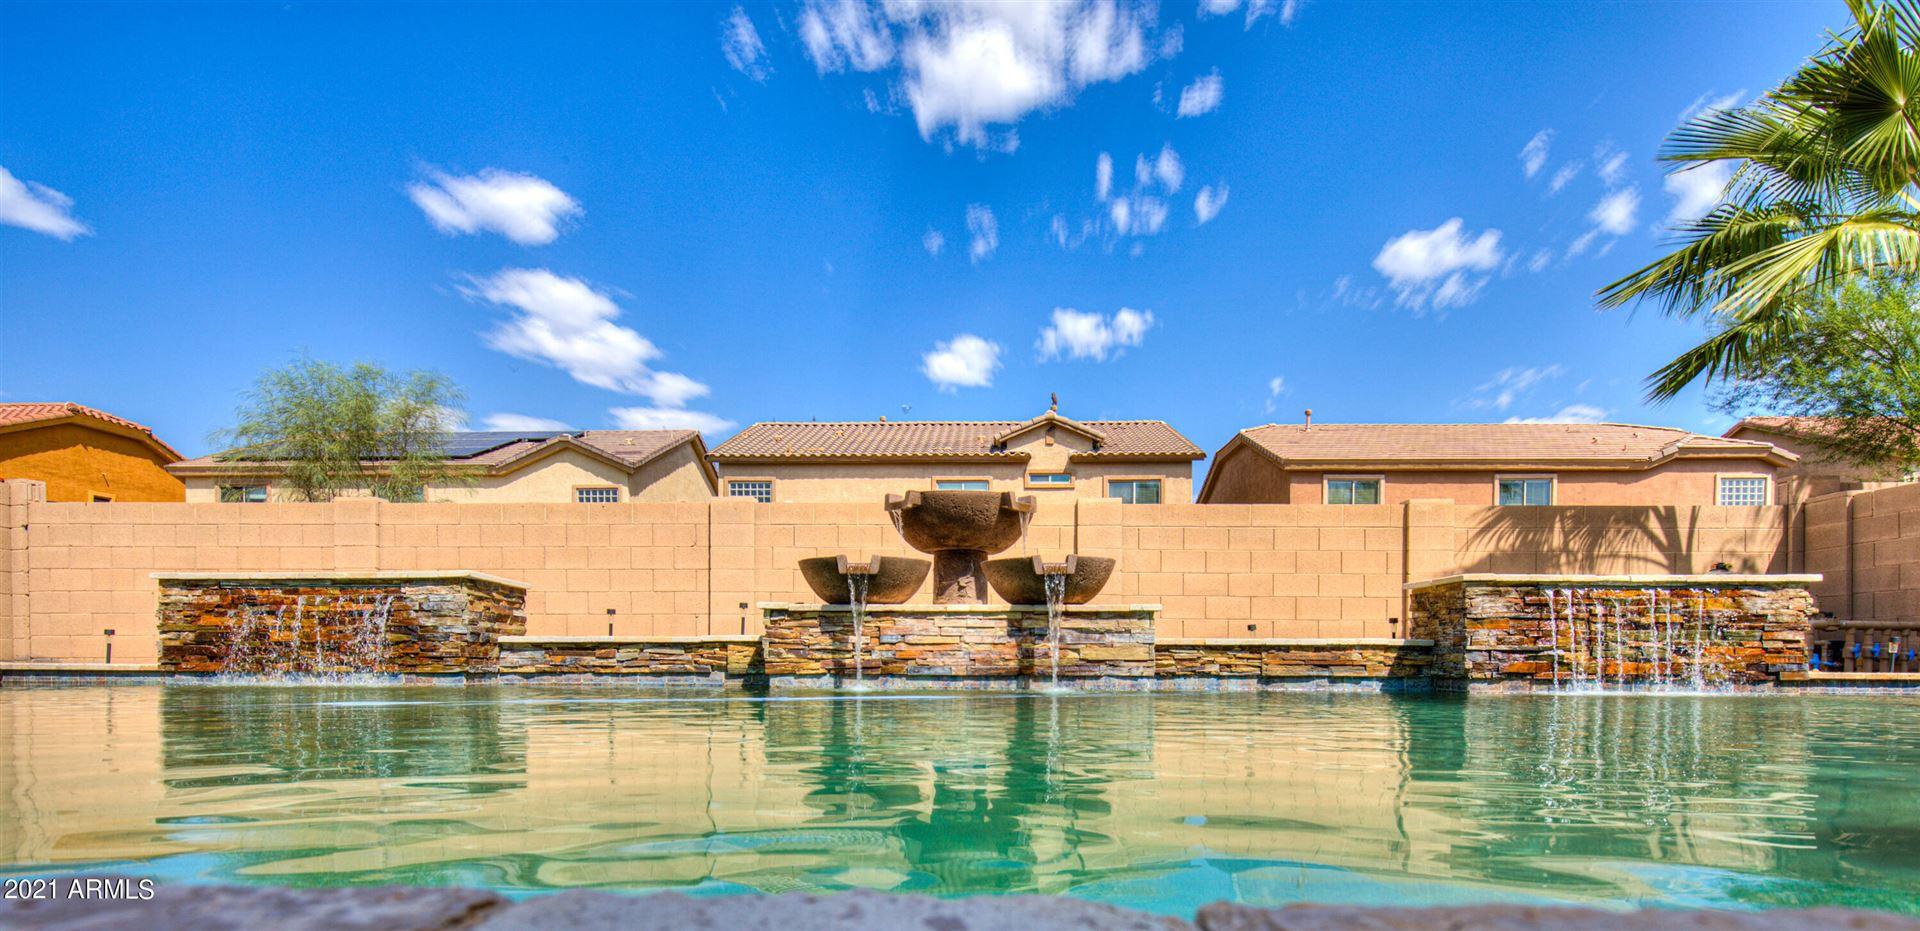 Photo of 44370 W YUCCA Lane, Maricopa, AZ 85138 (MLS # 6295795)